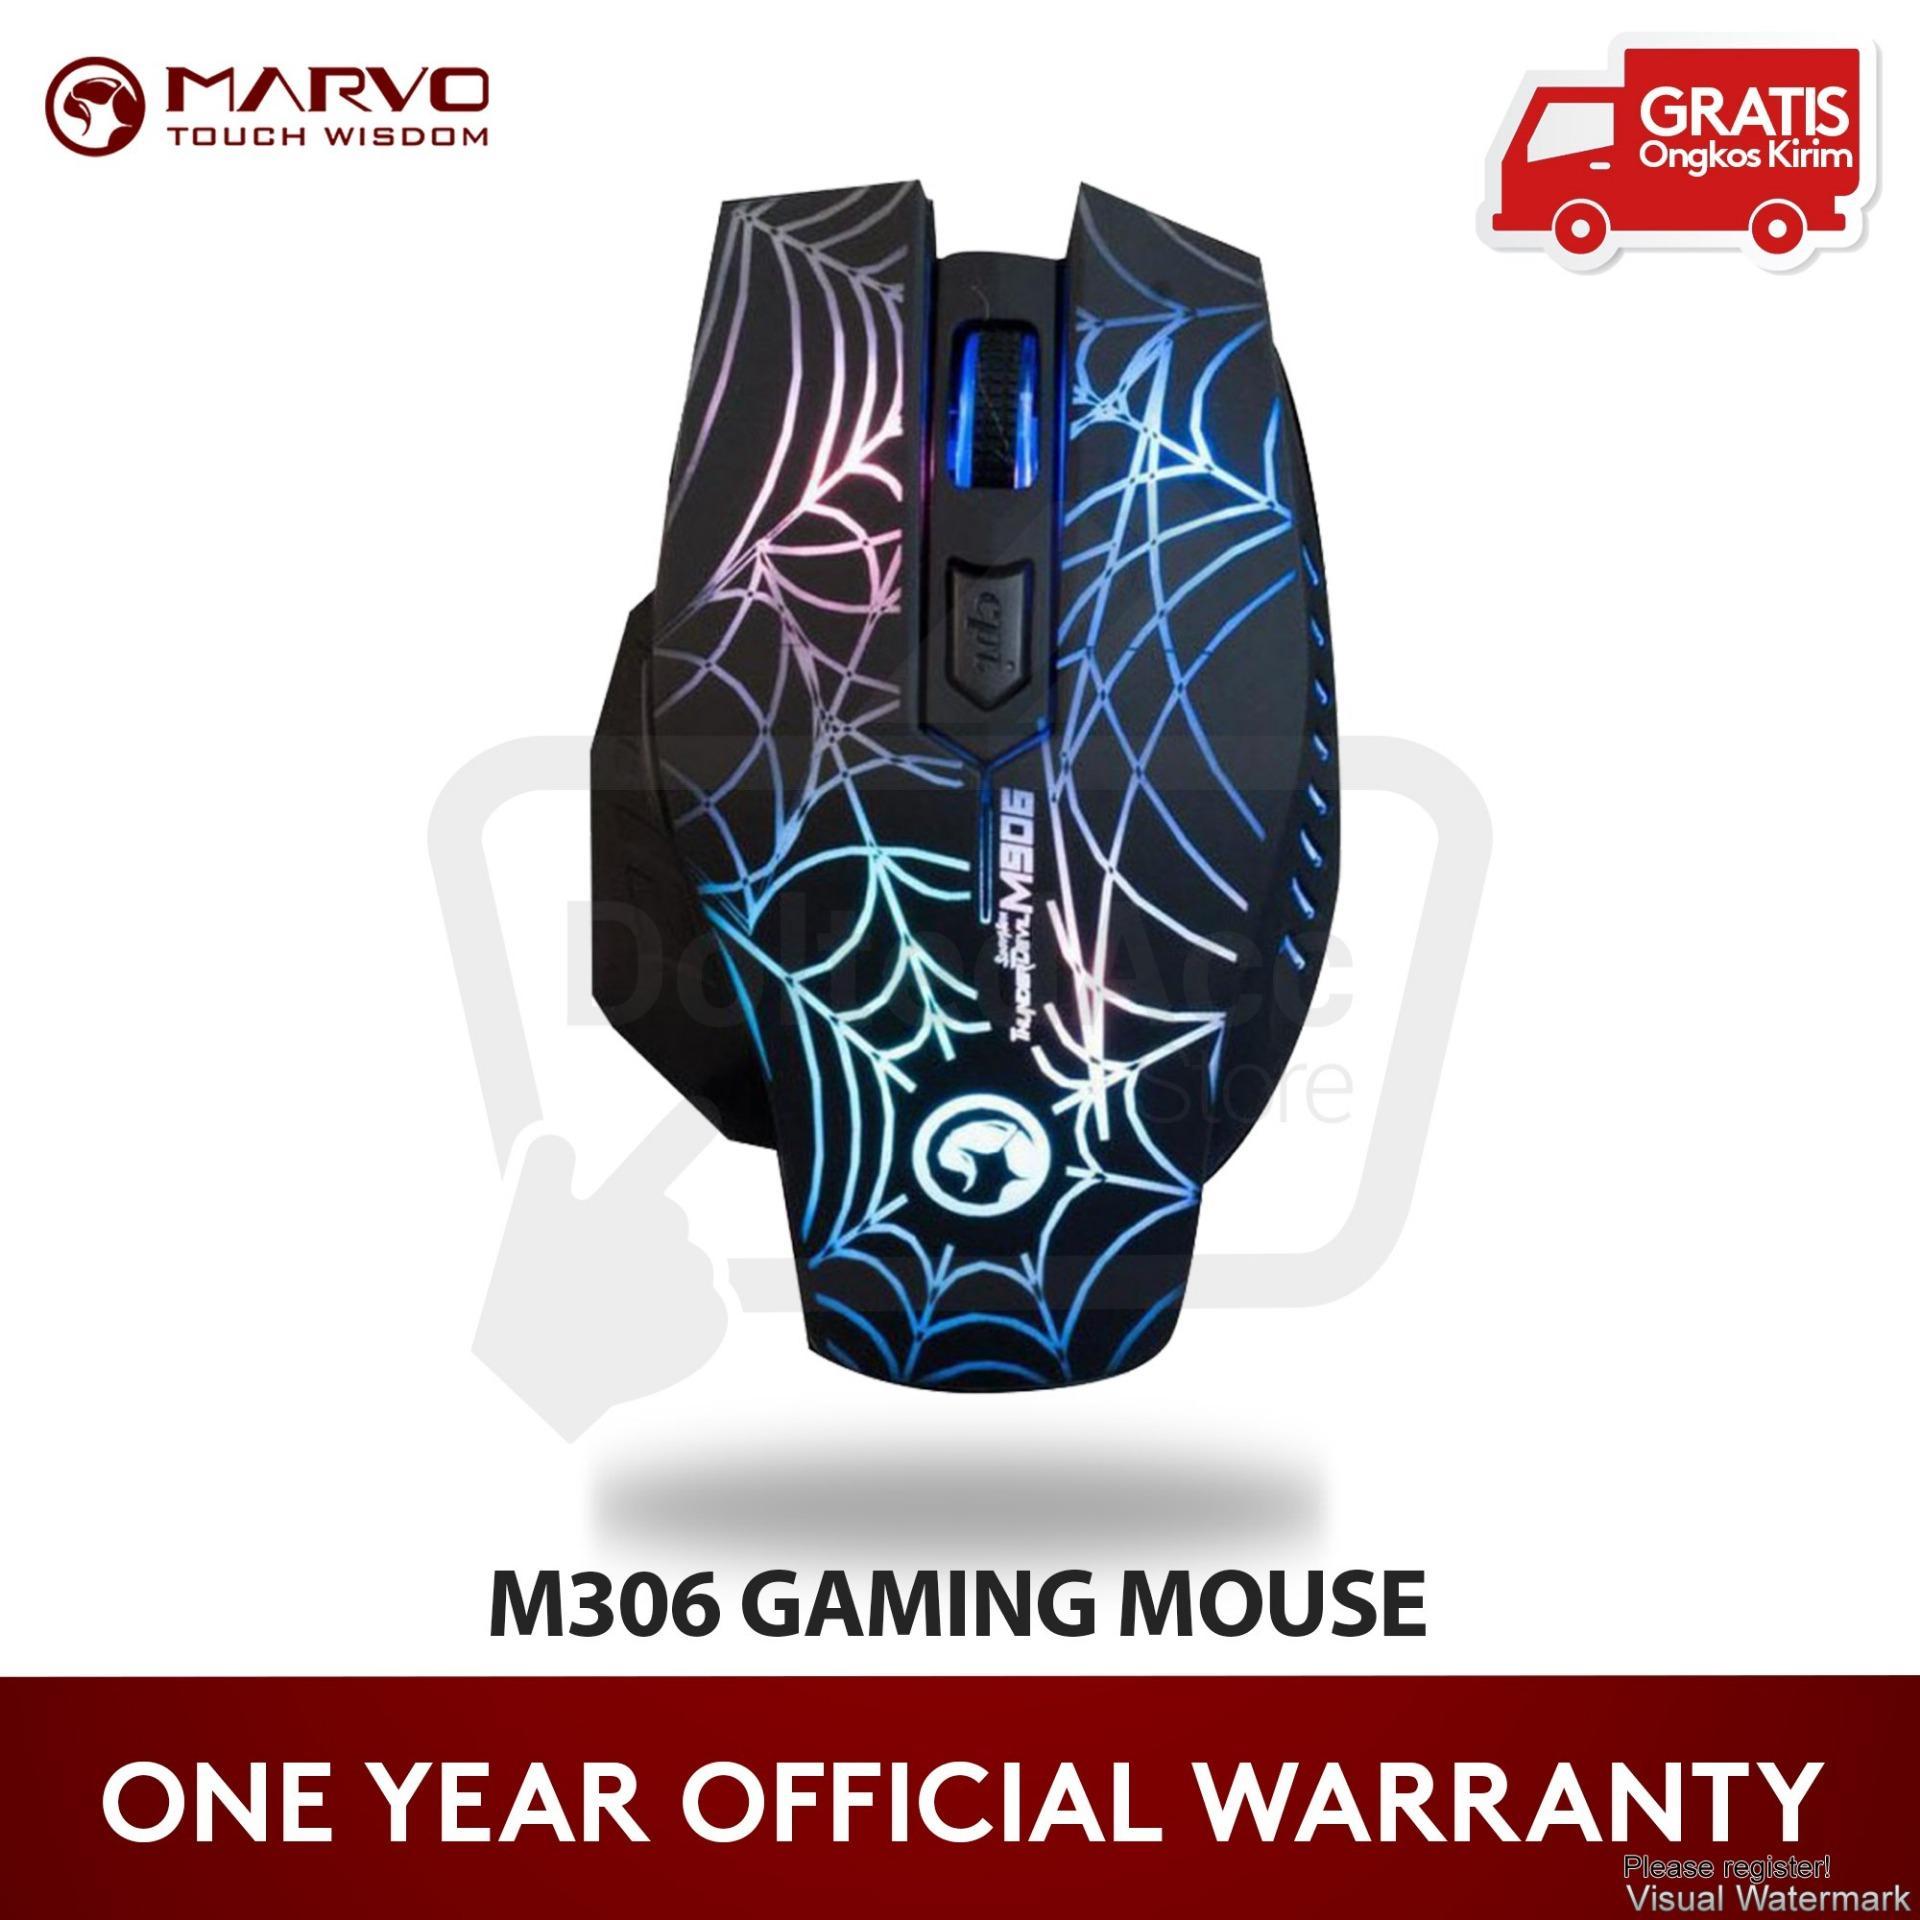 Jual Produk Marvo Terlengkap Headseet H8629 H8329 Gaming Mouse M306 6d 2400 Dpi Hitam